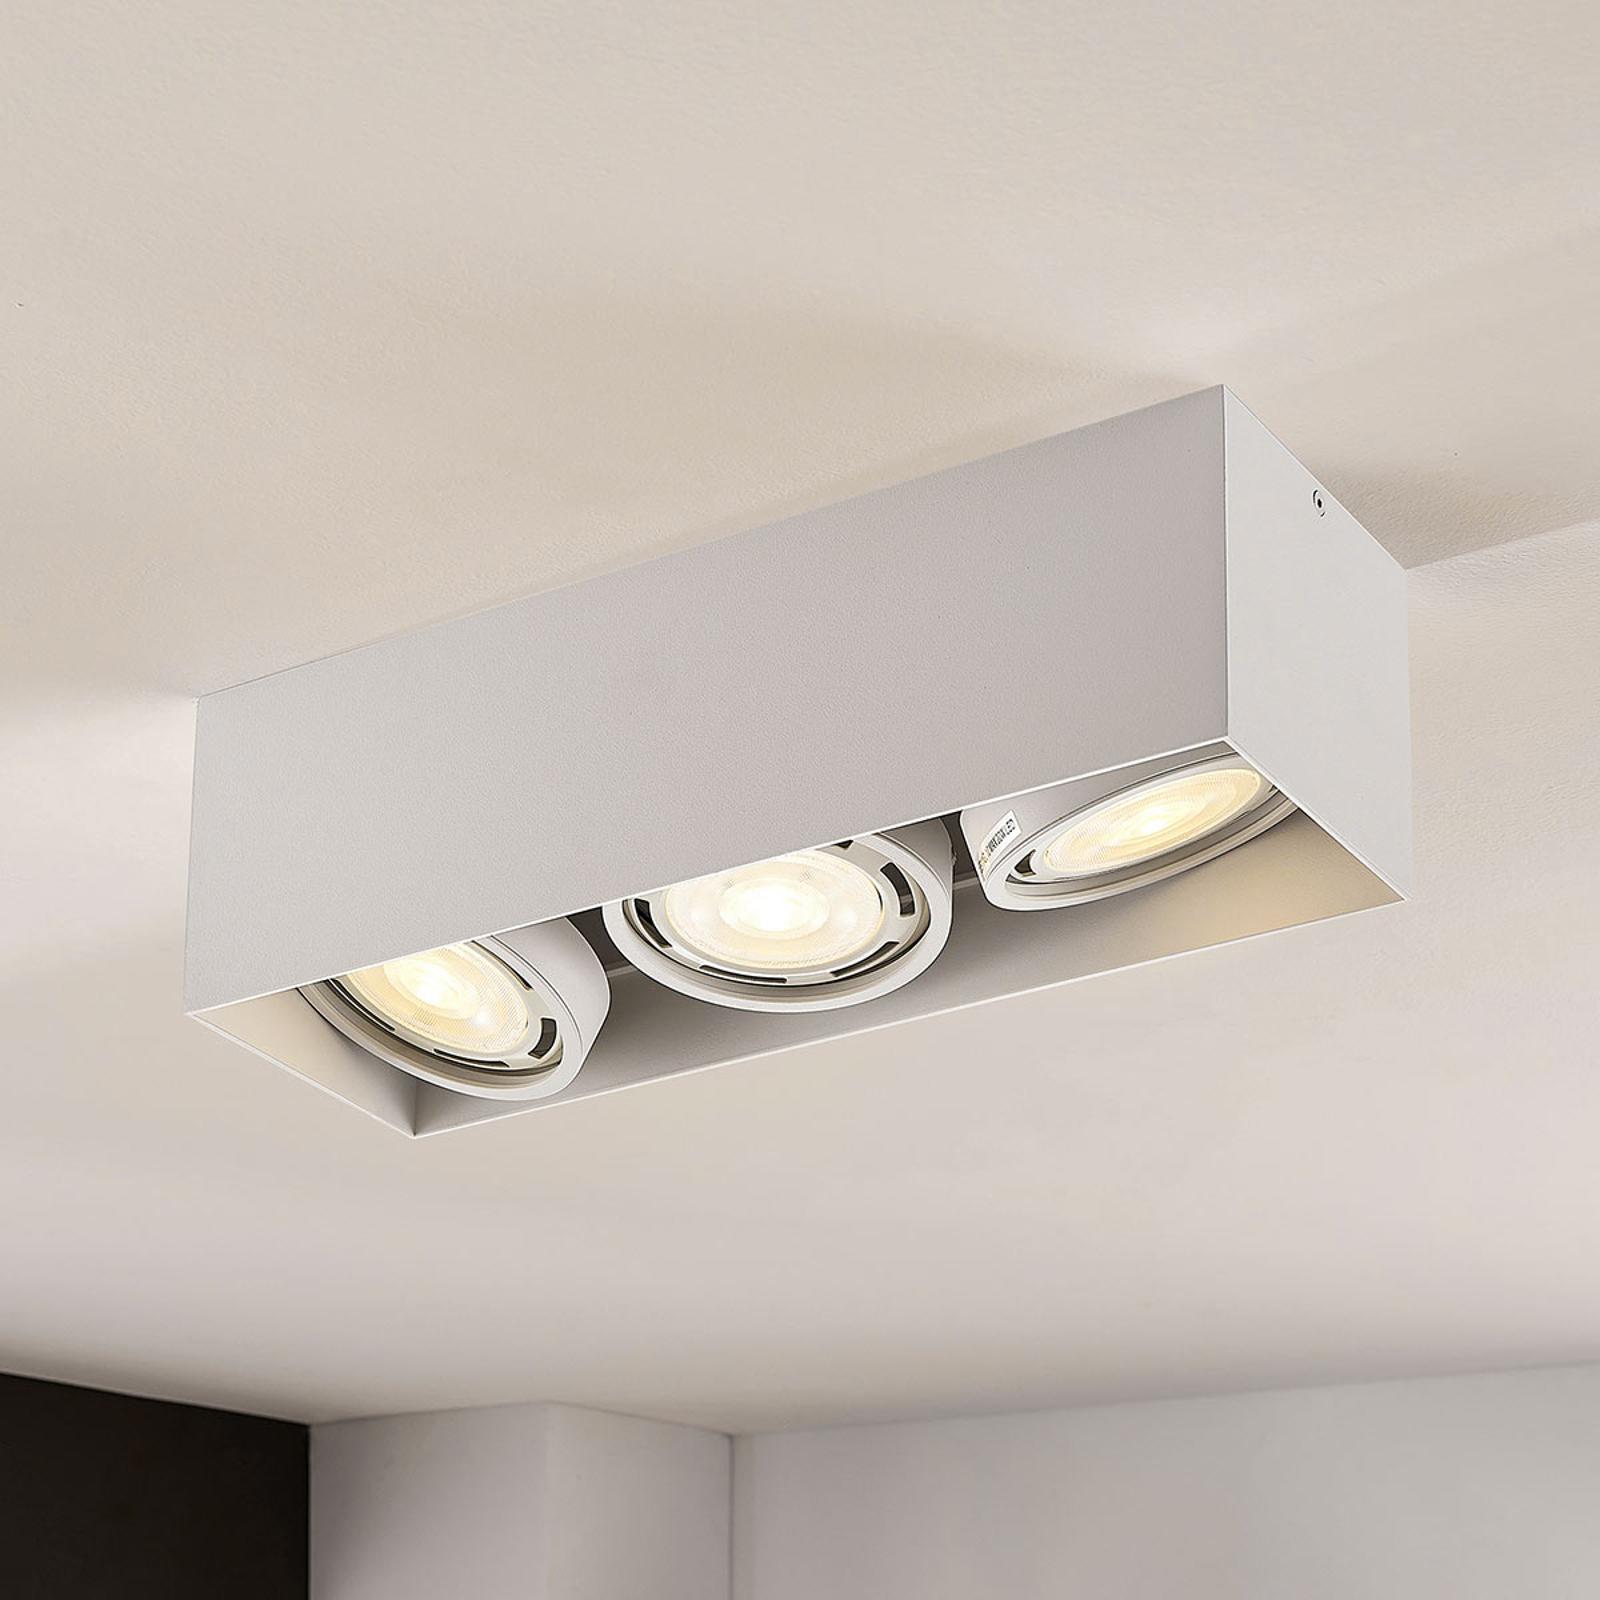 LED-Downlight Rosalie, dimmbar, eckig, 3-fl. weiß